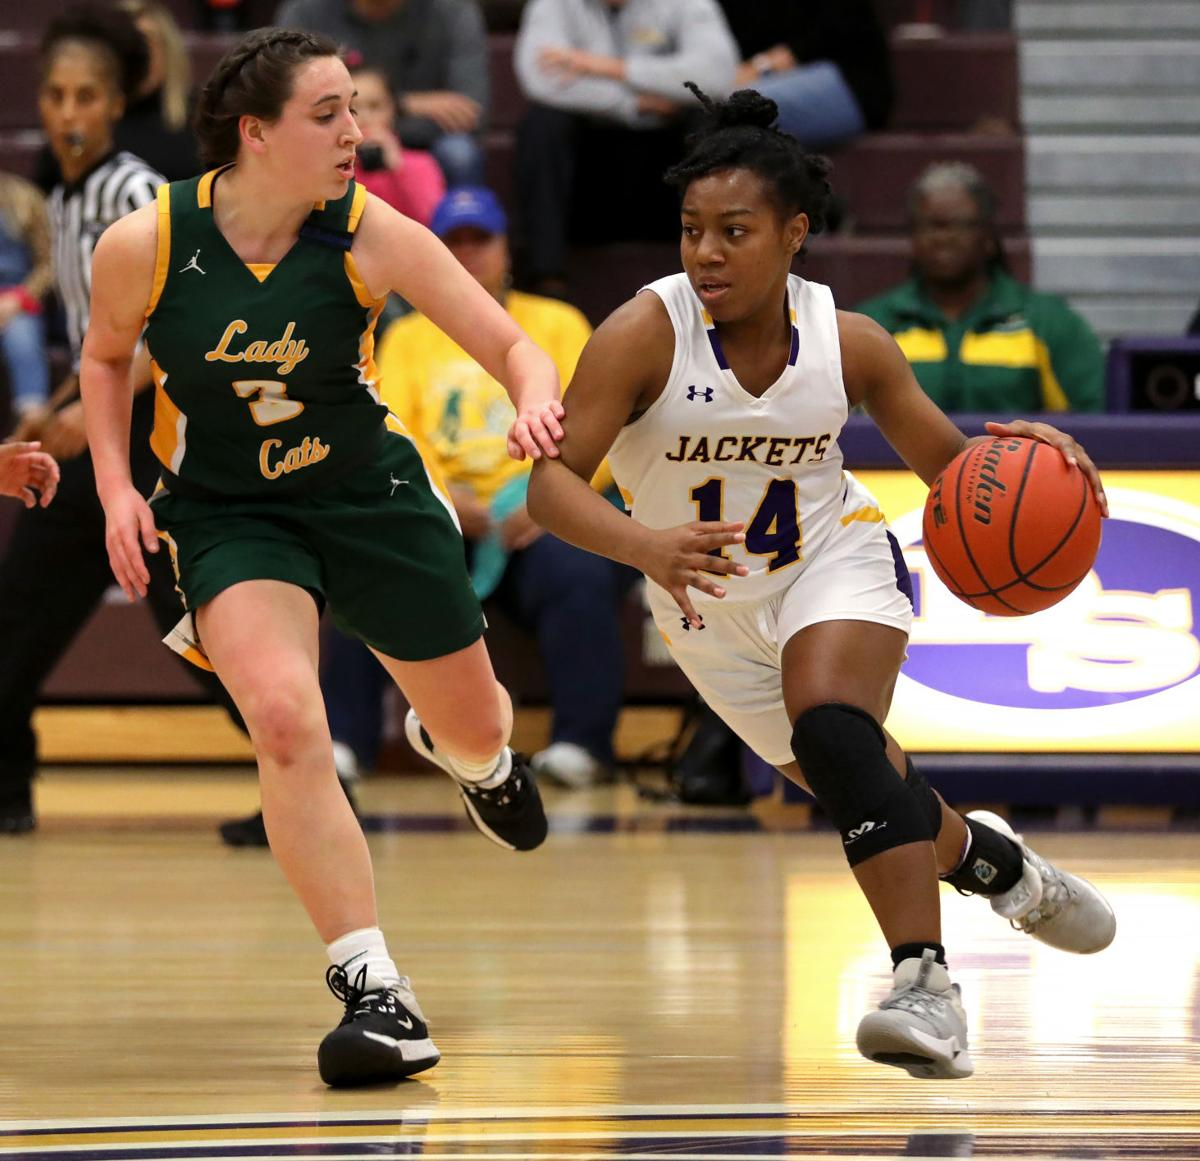 Walker at DSHS girls basketball Violett Jackson, Delaney Anderson